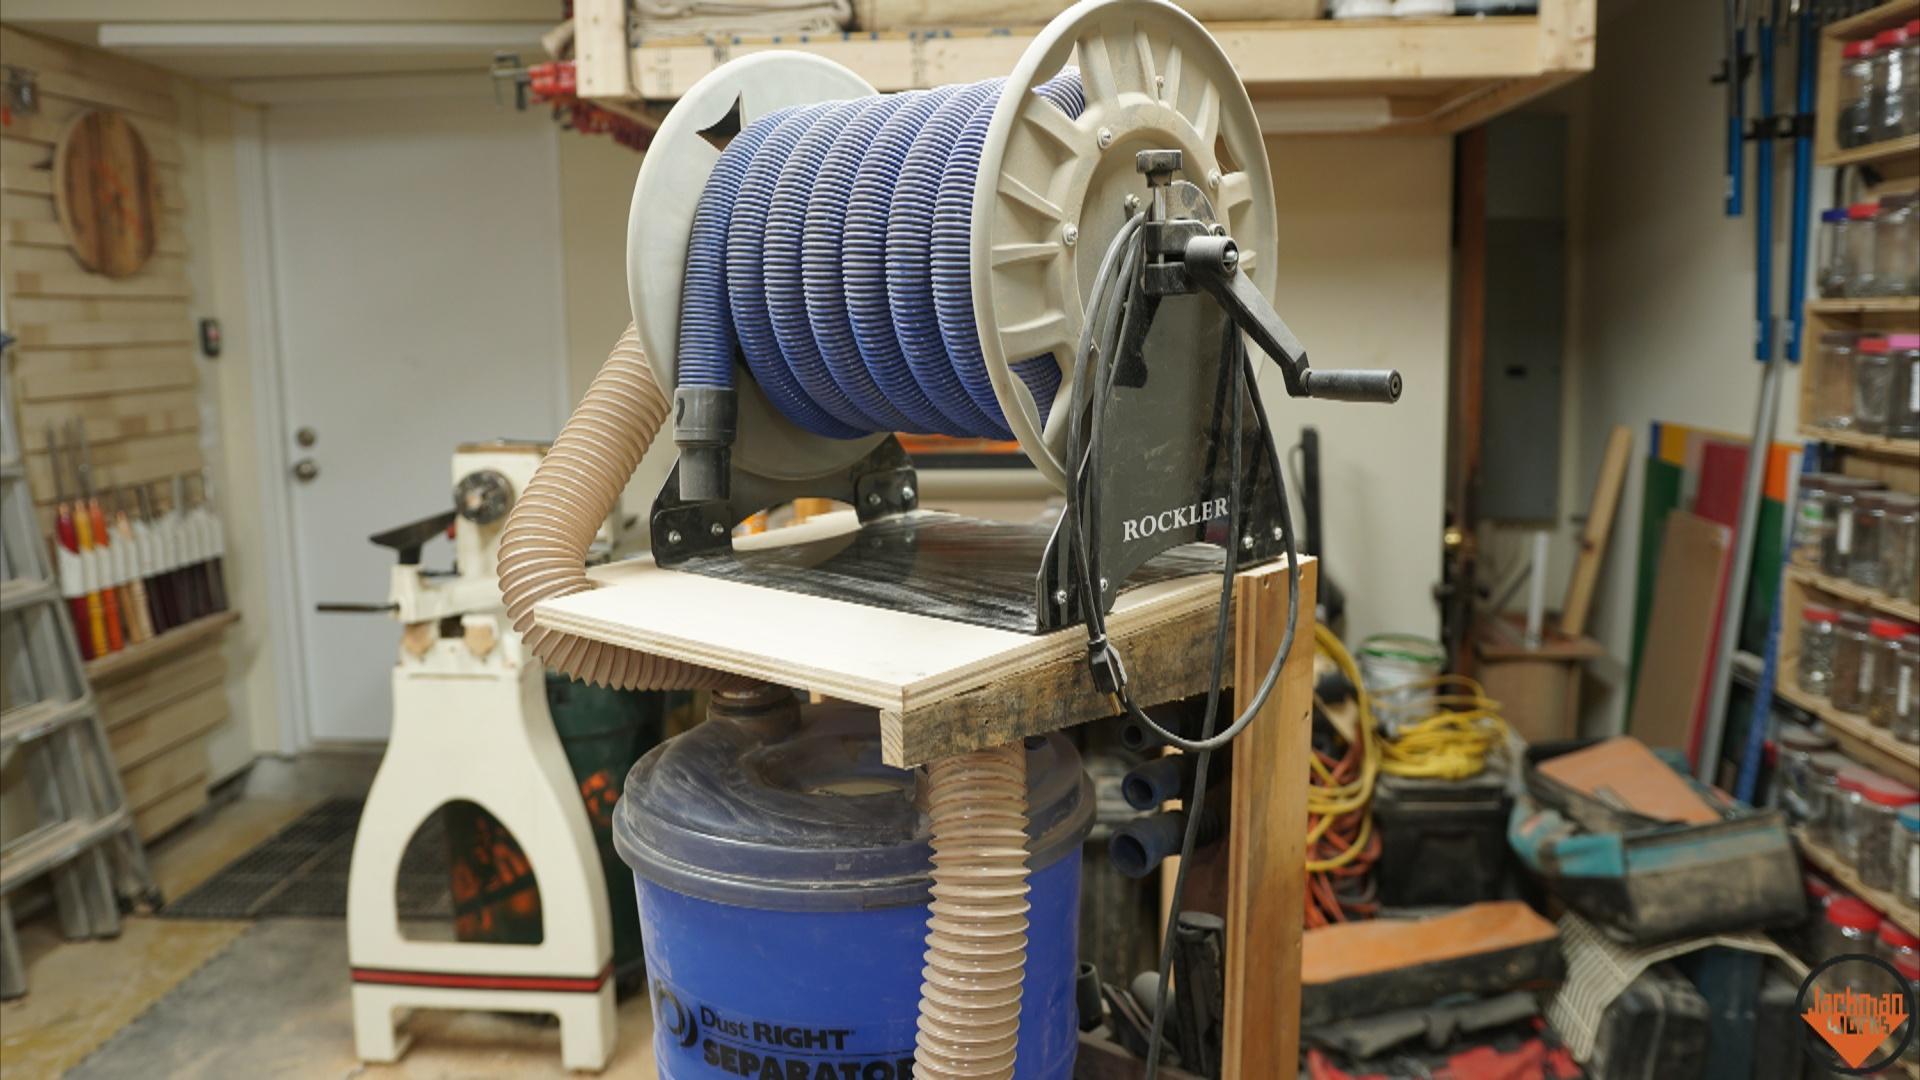 Space Saving Shop-Vac Dust Collector Cart 34 – Jackman Works